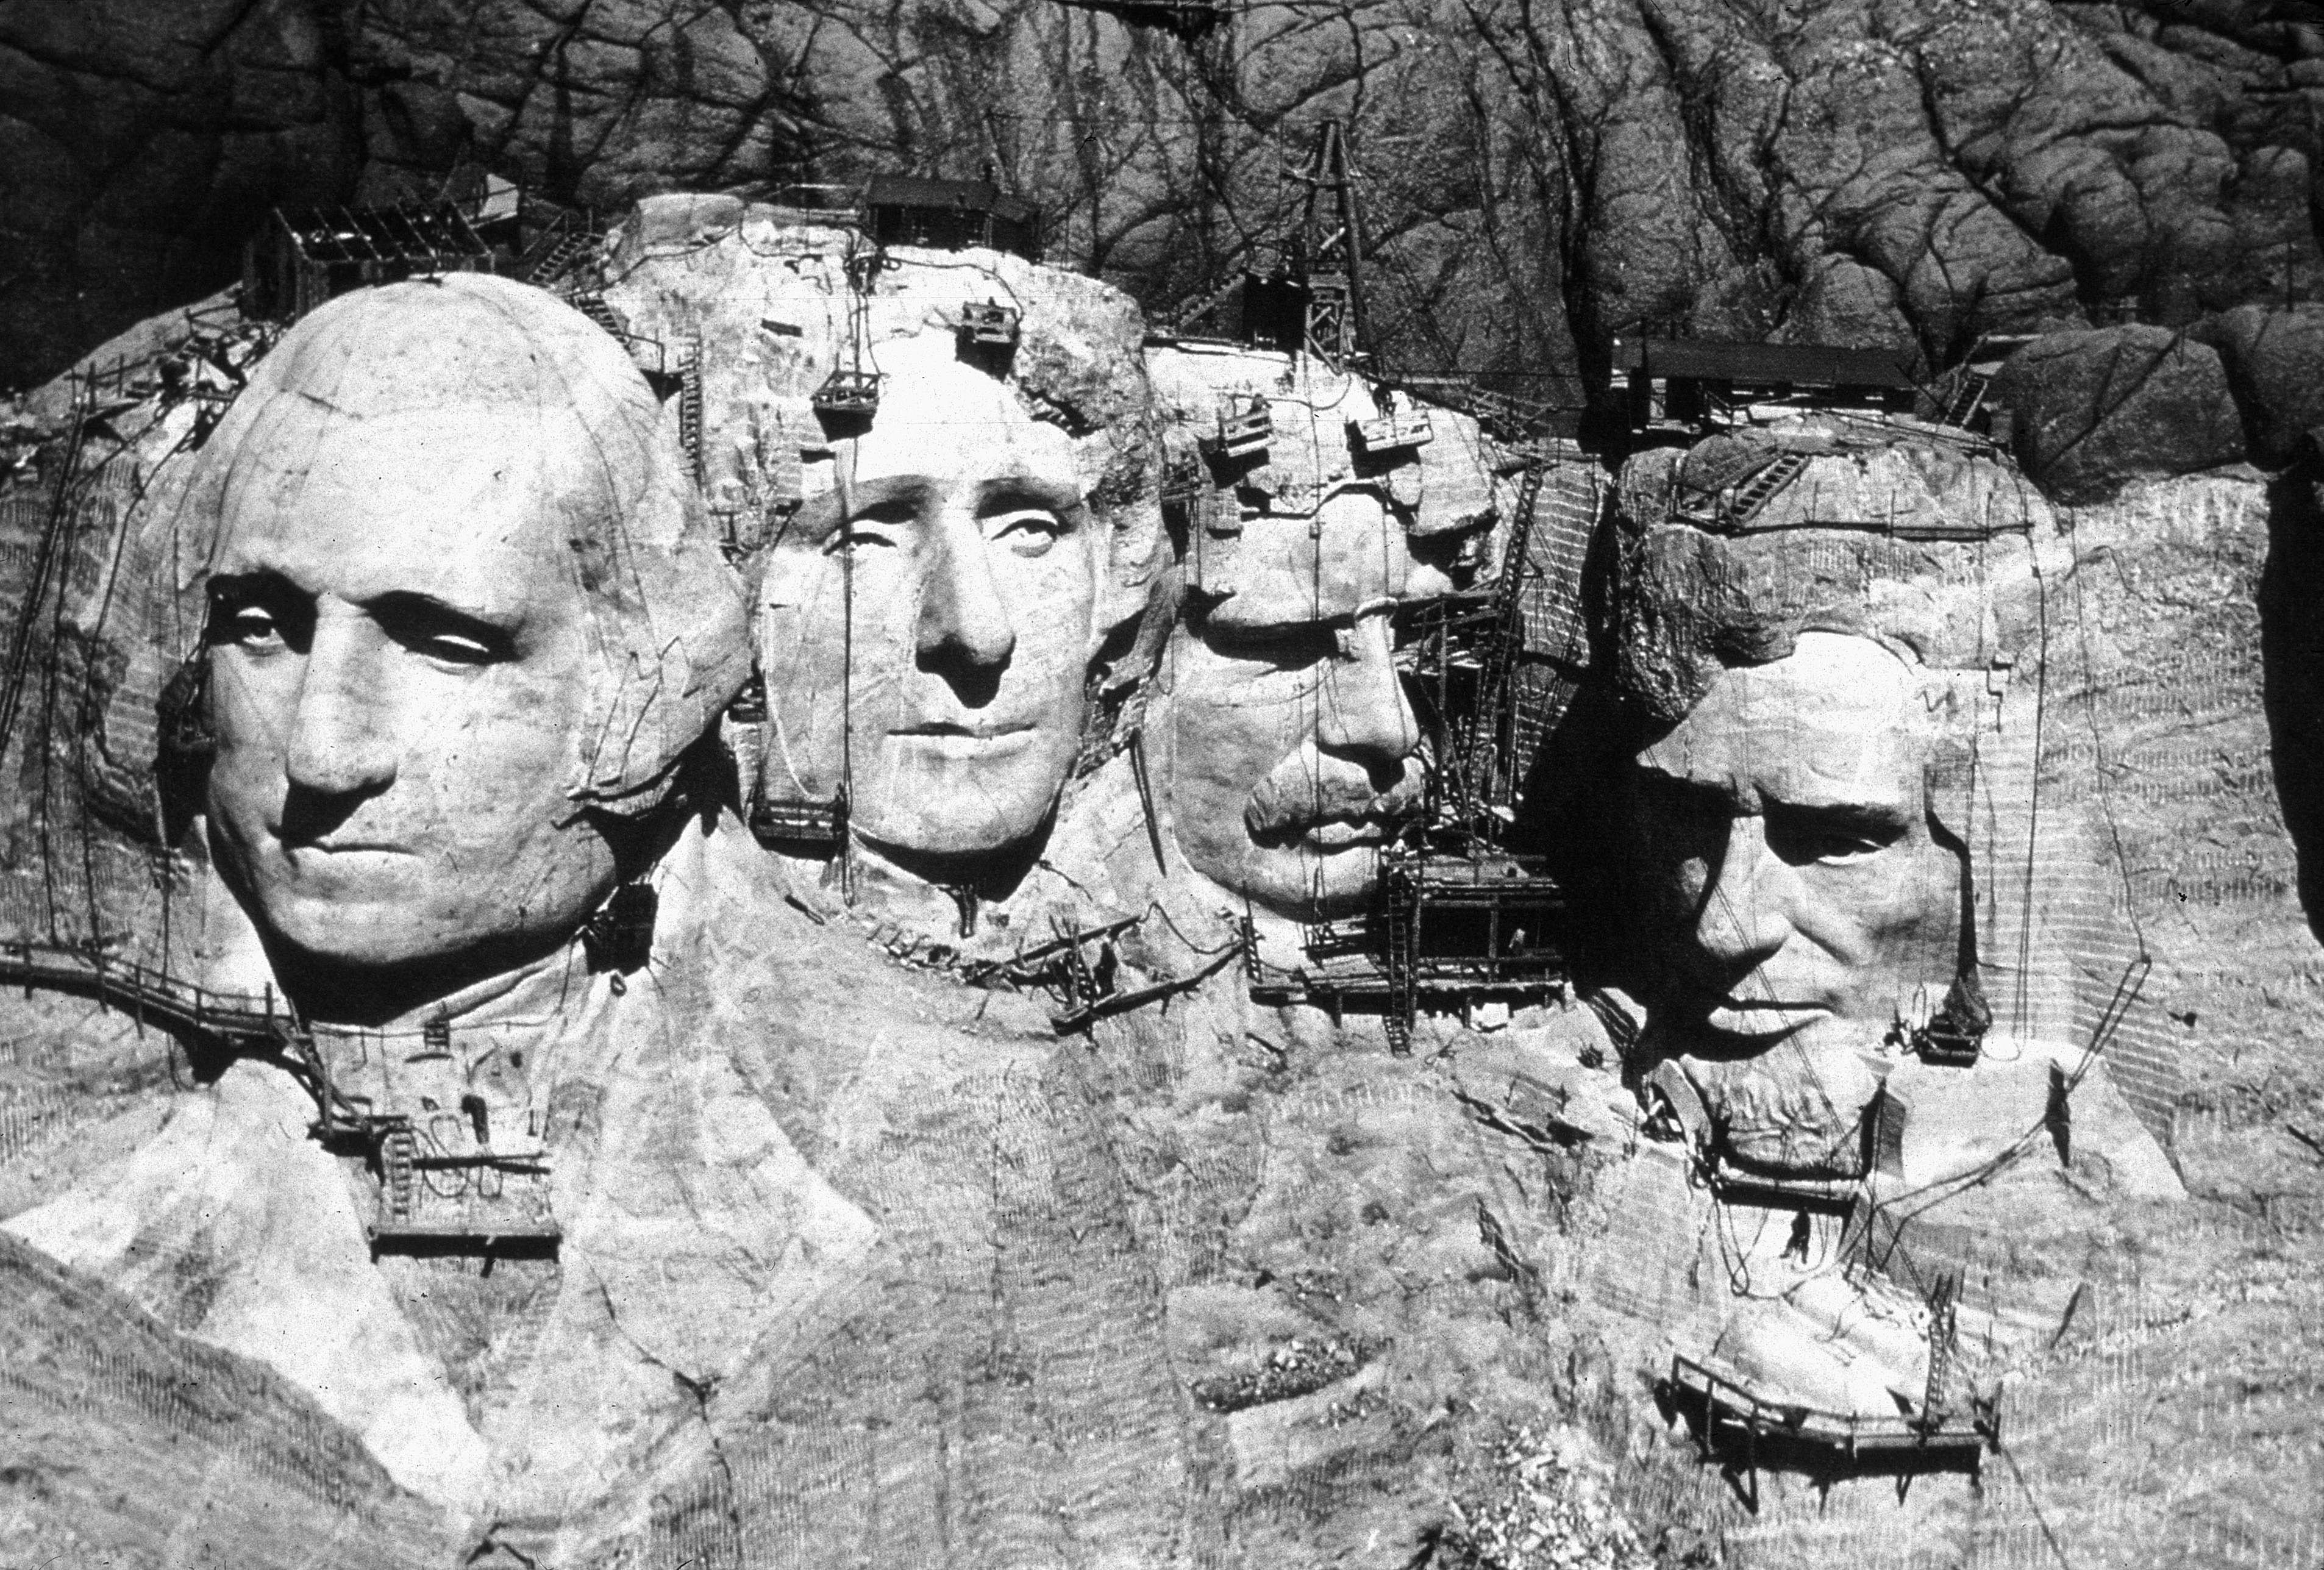 Mount Rushmore under construction.